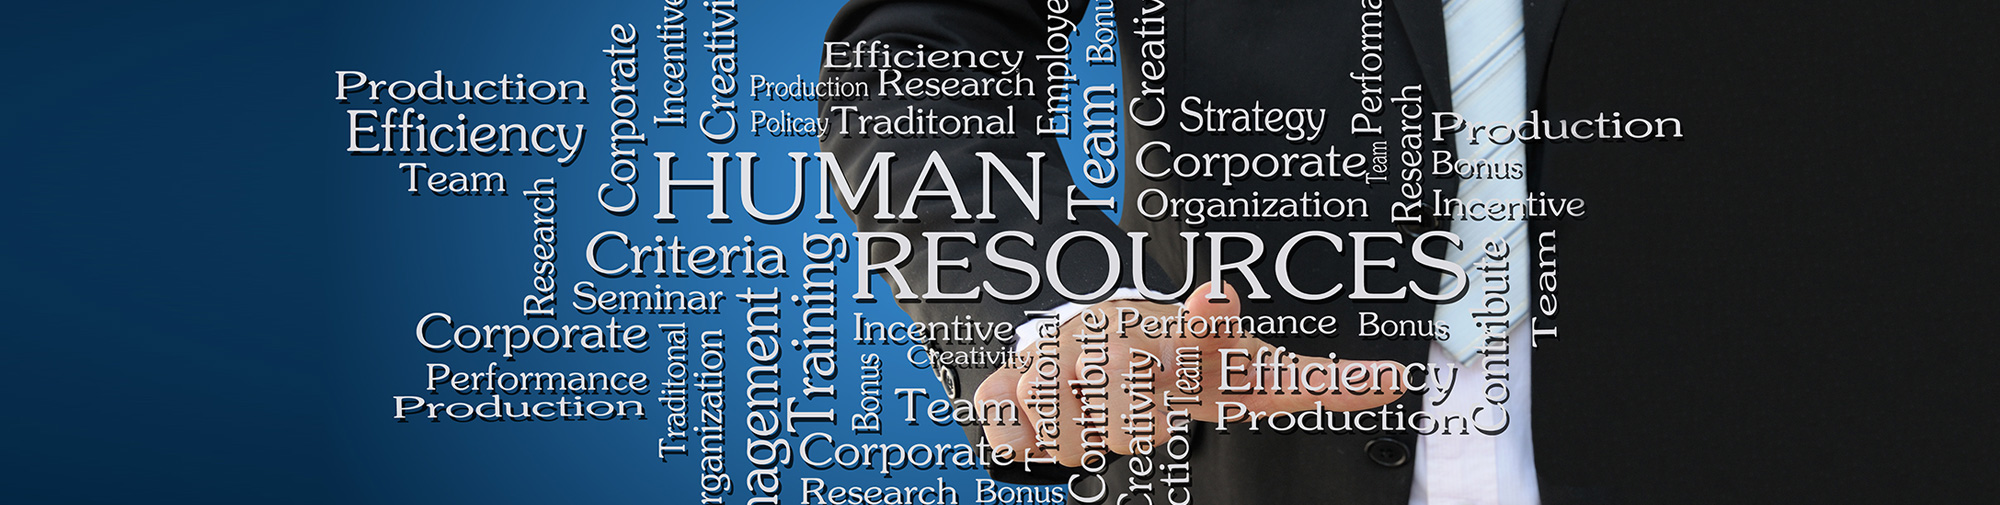 https://www.gekterna.com/userfiles/11e3ebfa-92f9-4083-8c5b-a26d00fe9b3c/Human_Resources_2.jpg